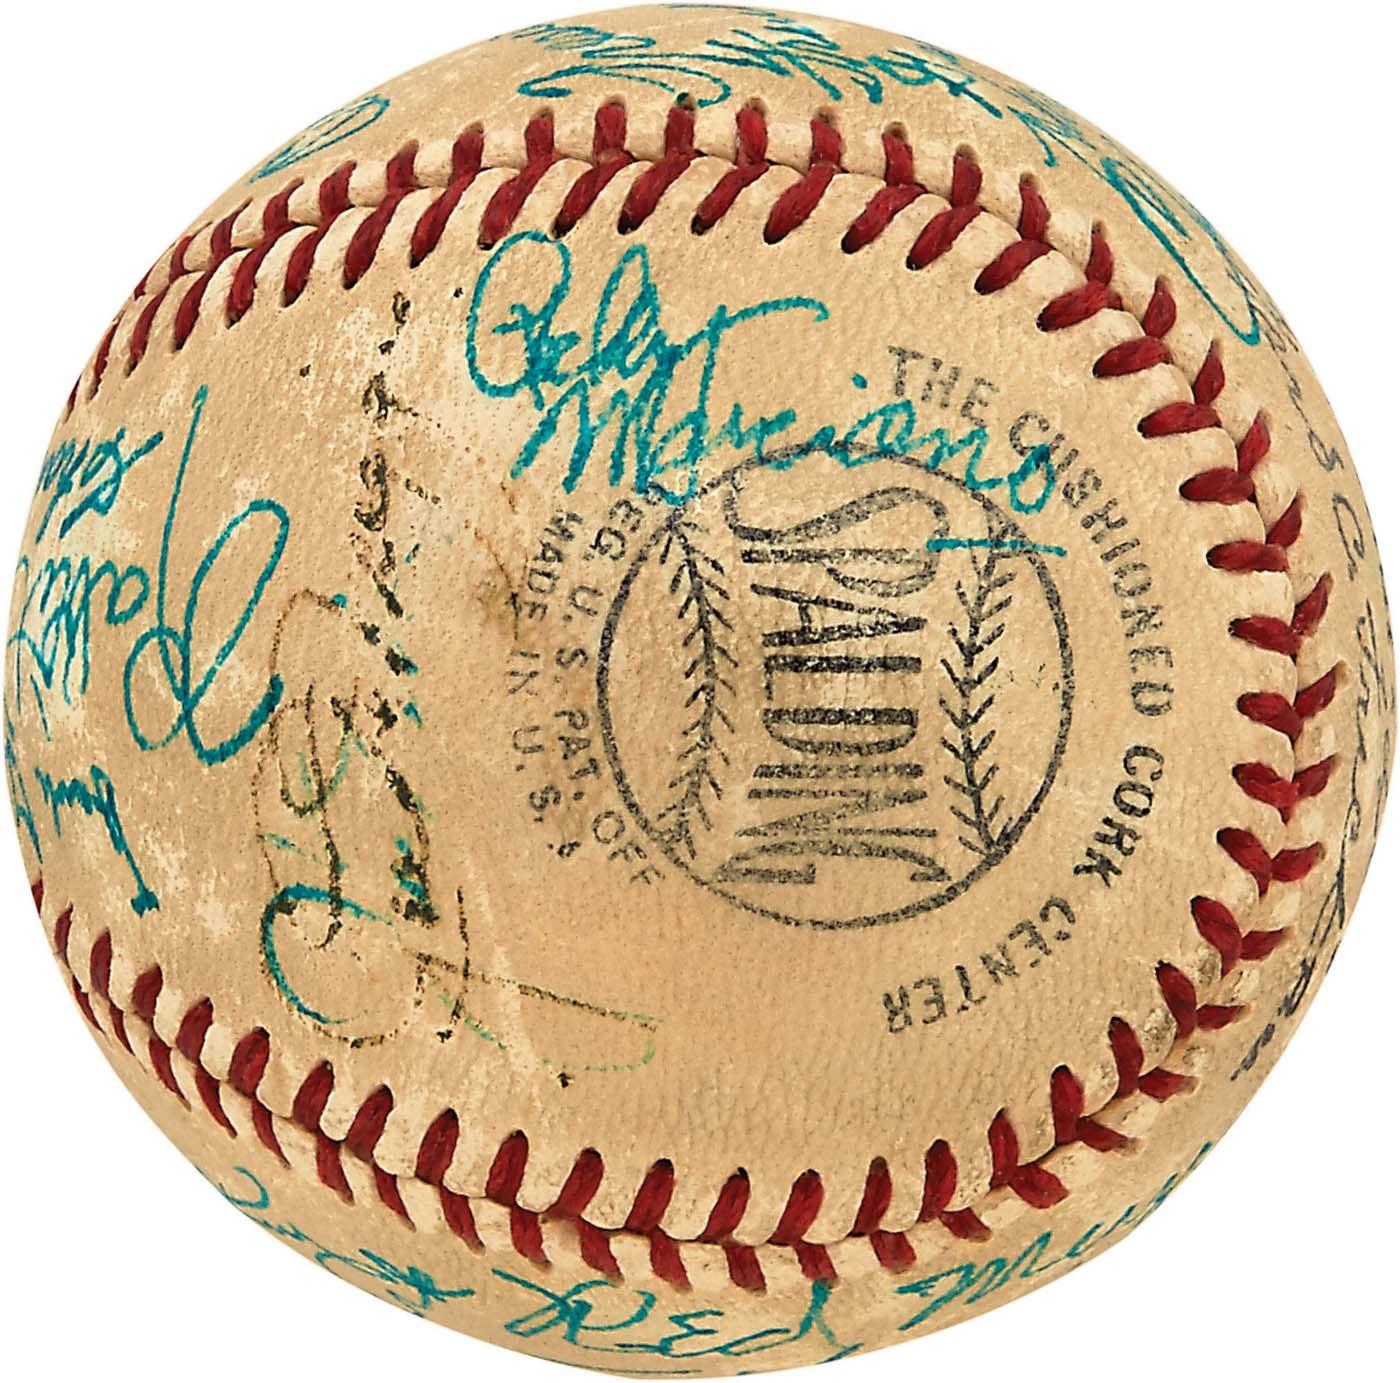 Baseball Autographs - Masters17